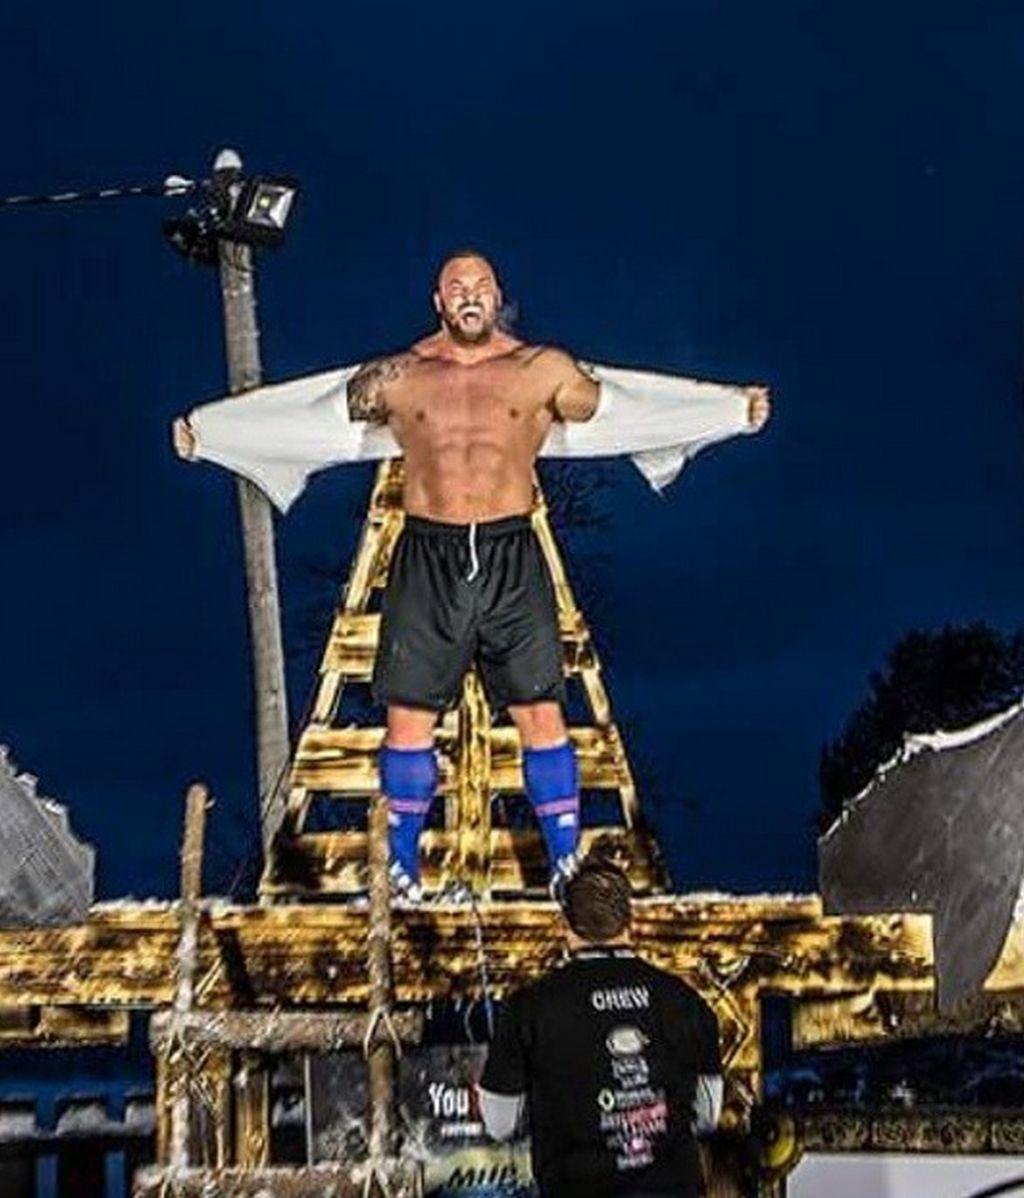 La Montaña bate un récord vikingo: levanta 650 kilos